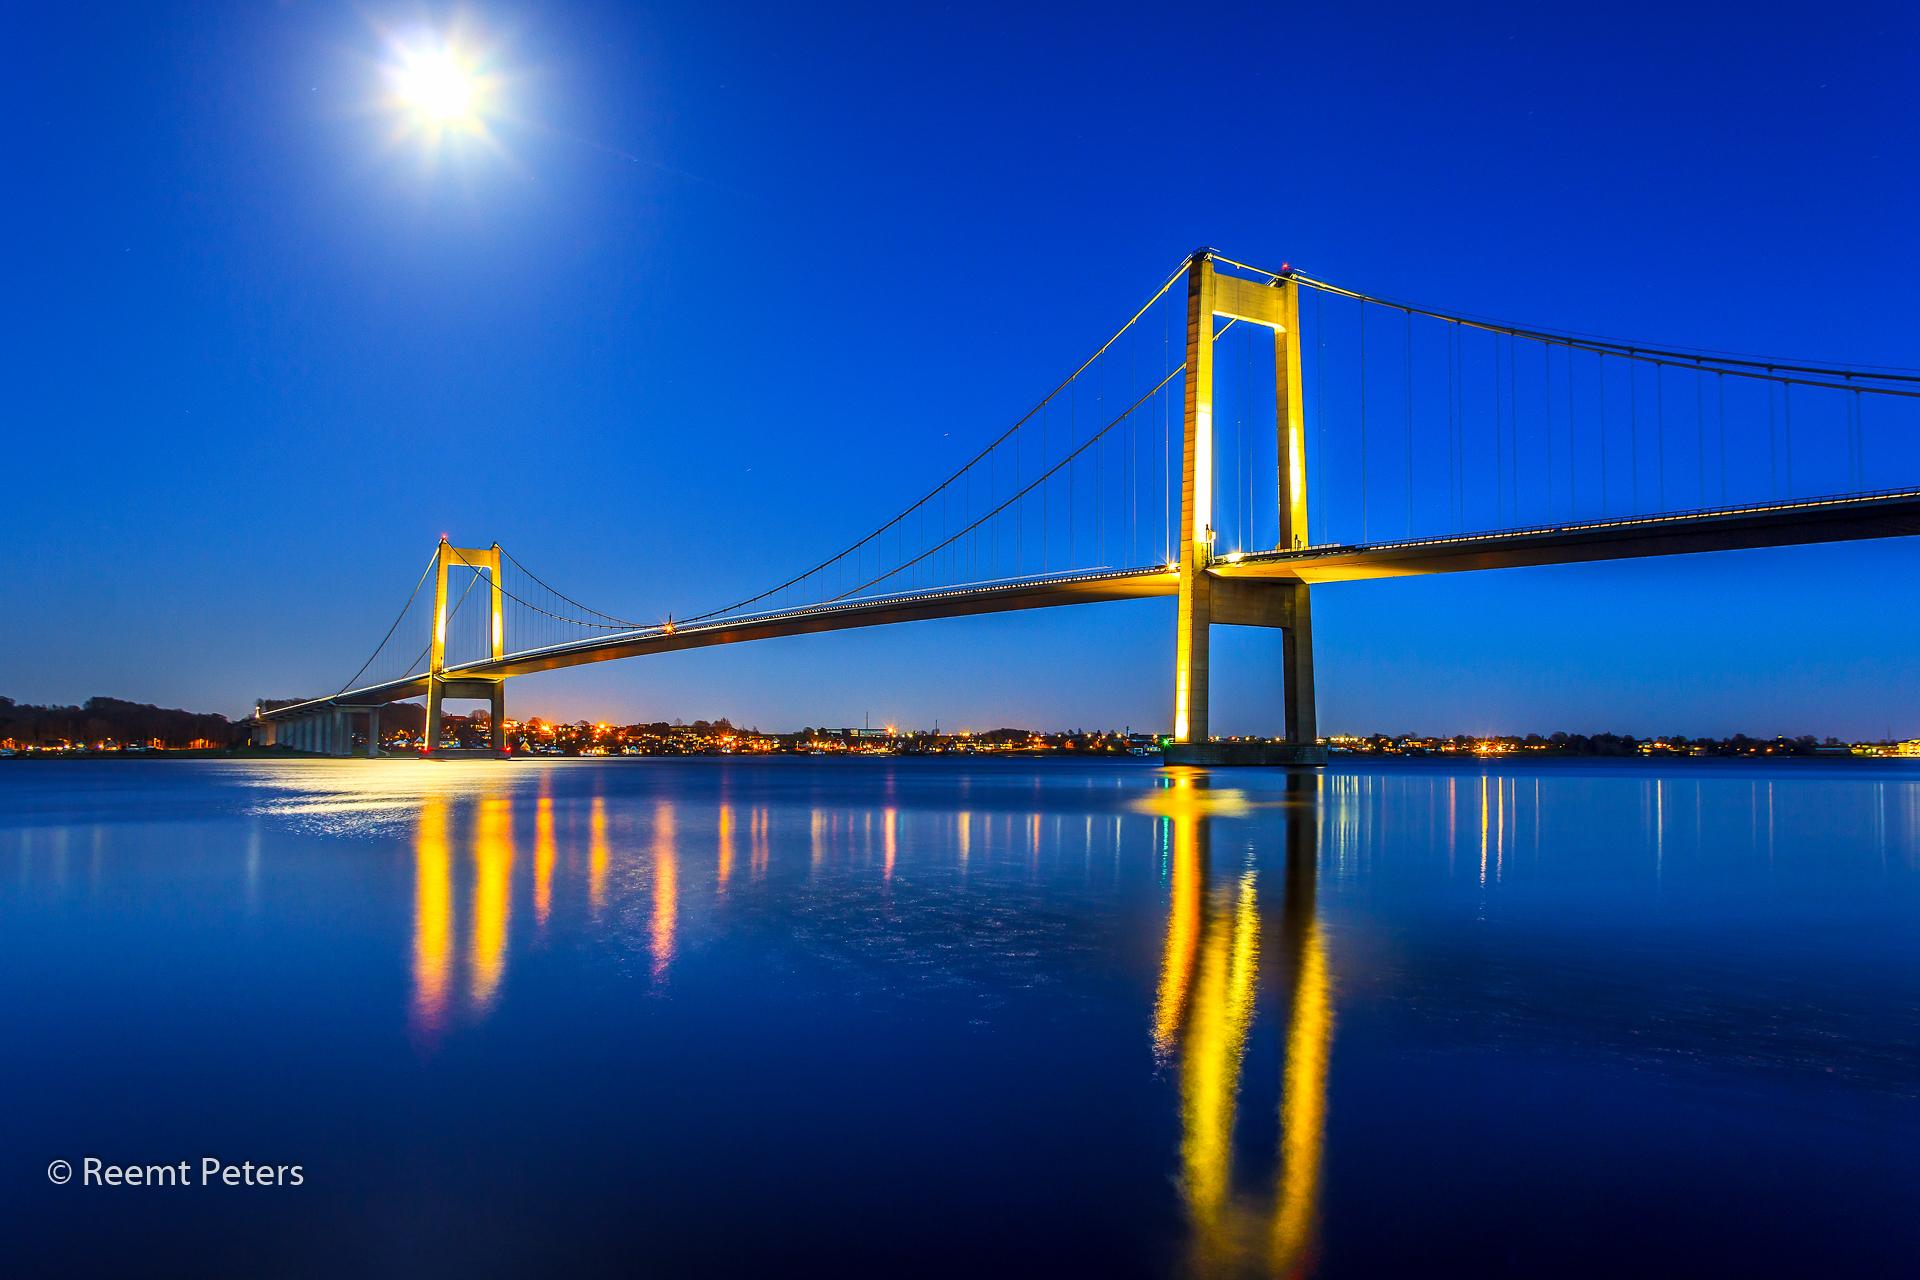 Ny Lillebæltsbro, Denmark